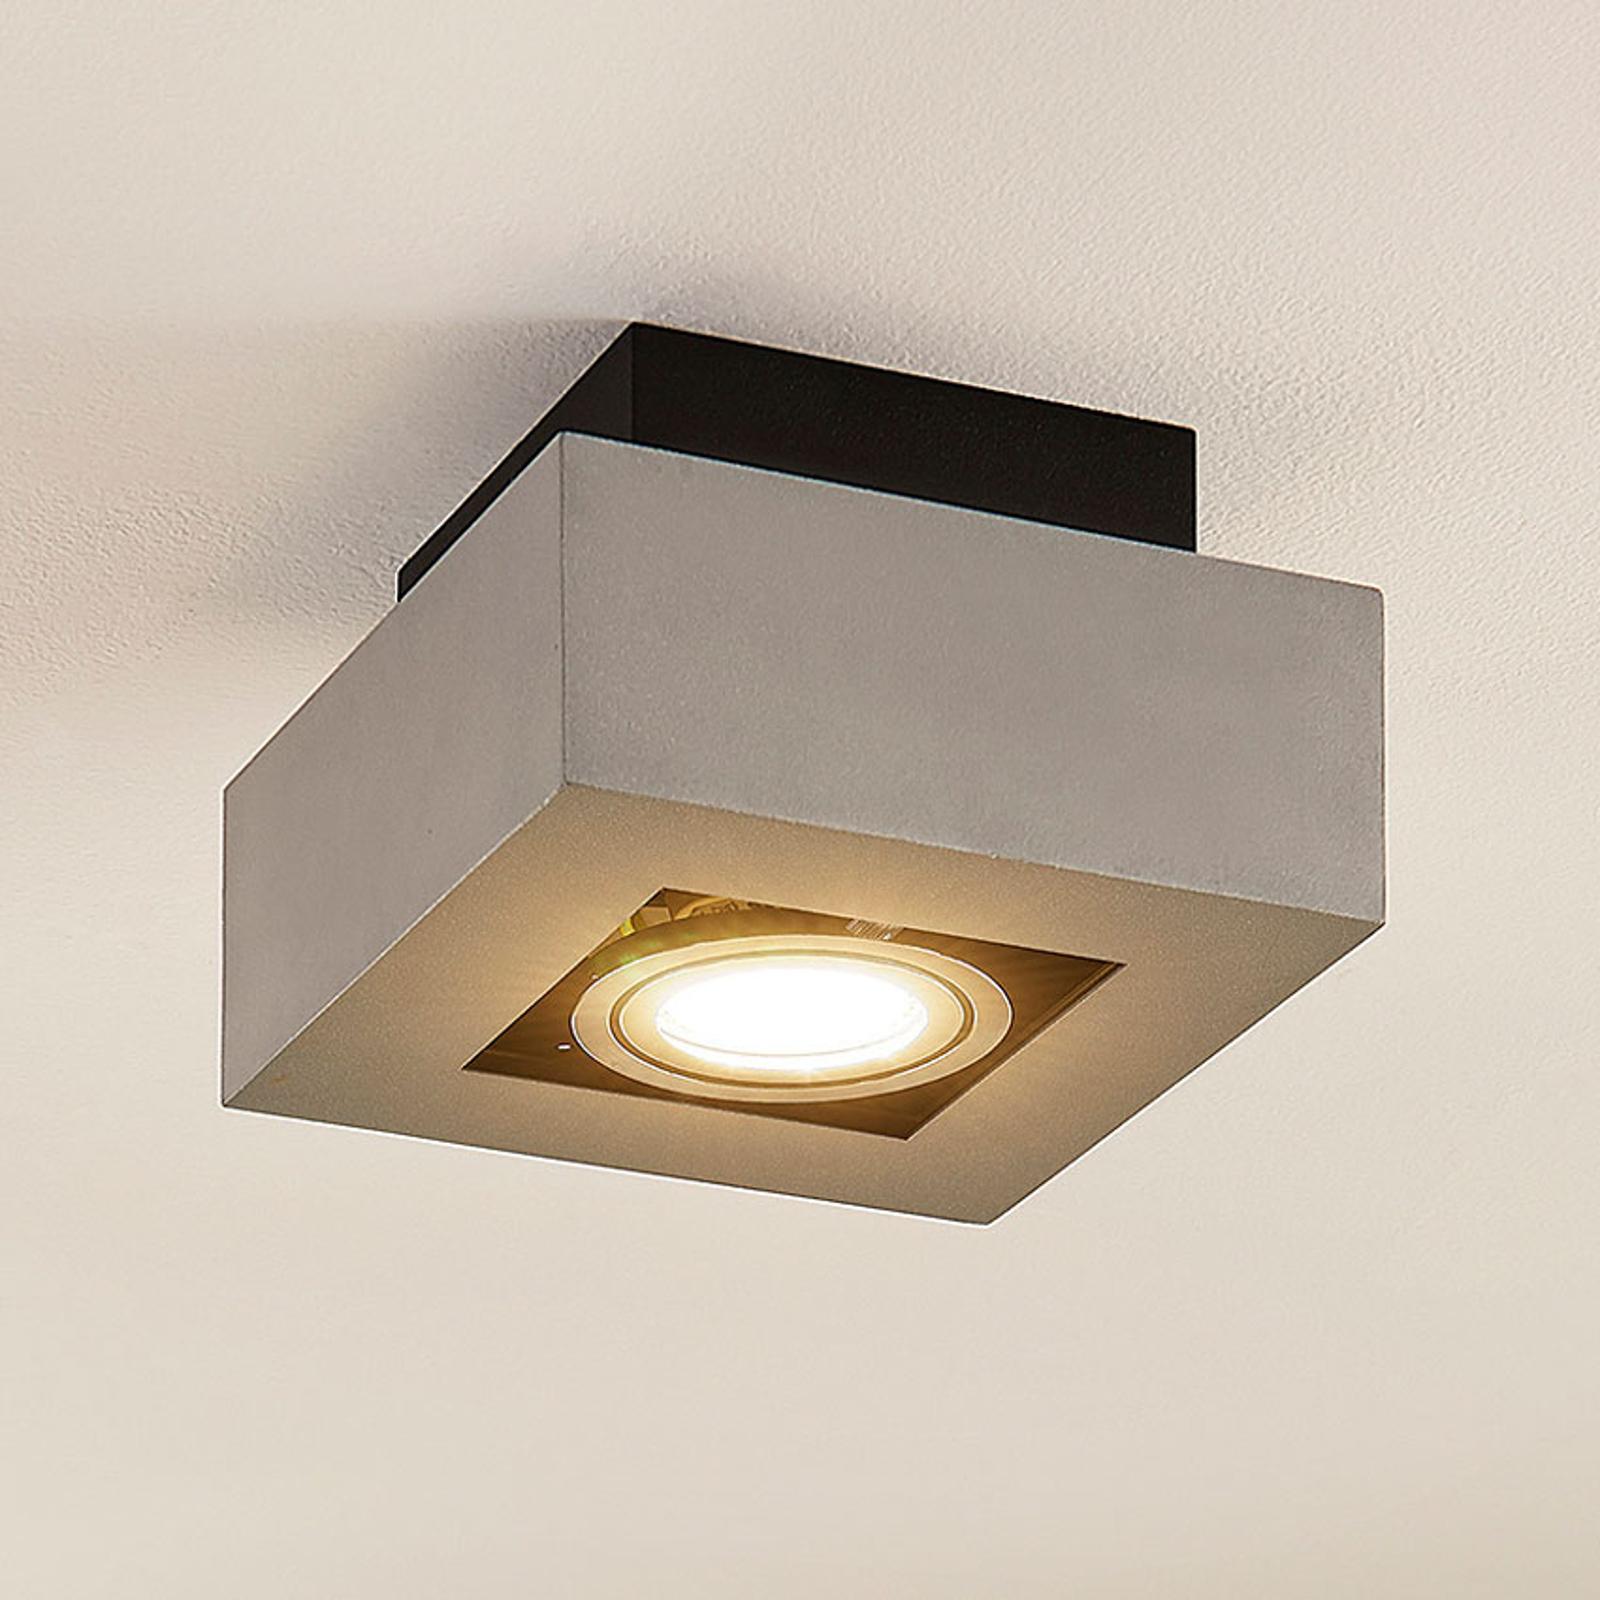 Aluminiowa lampa sufitowa LED VINCE